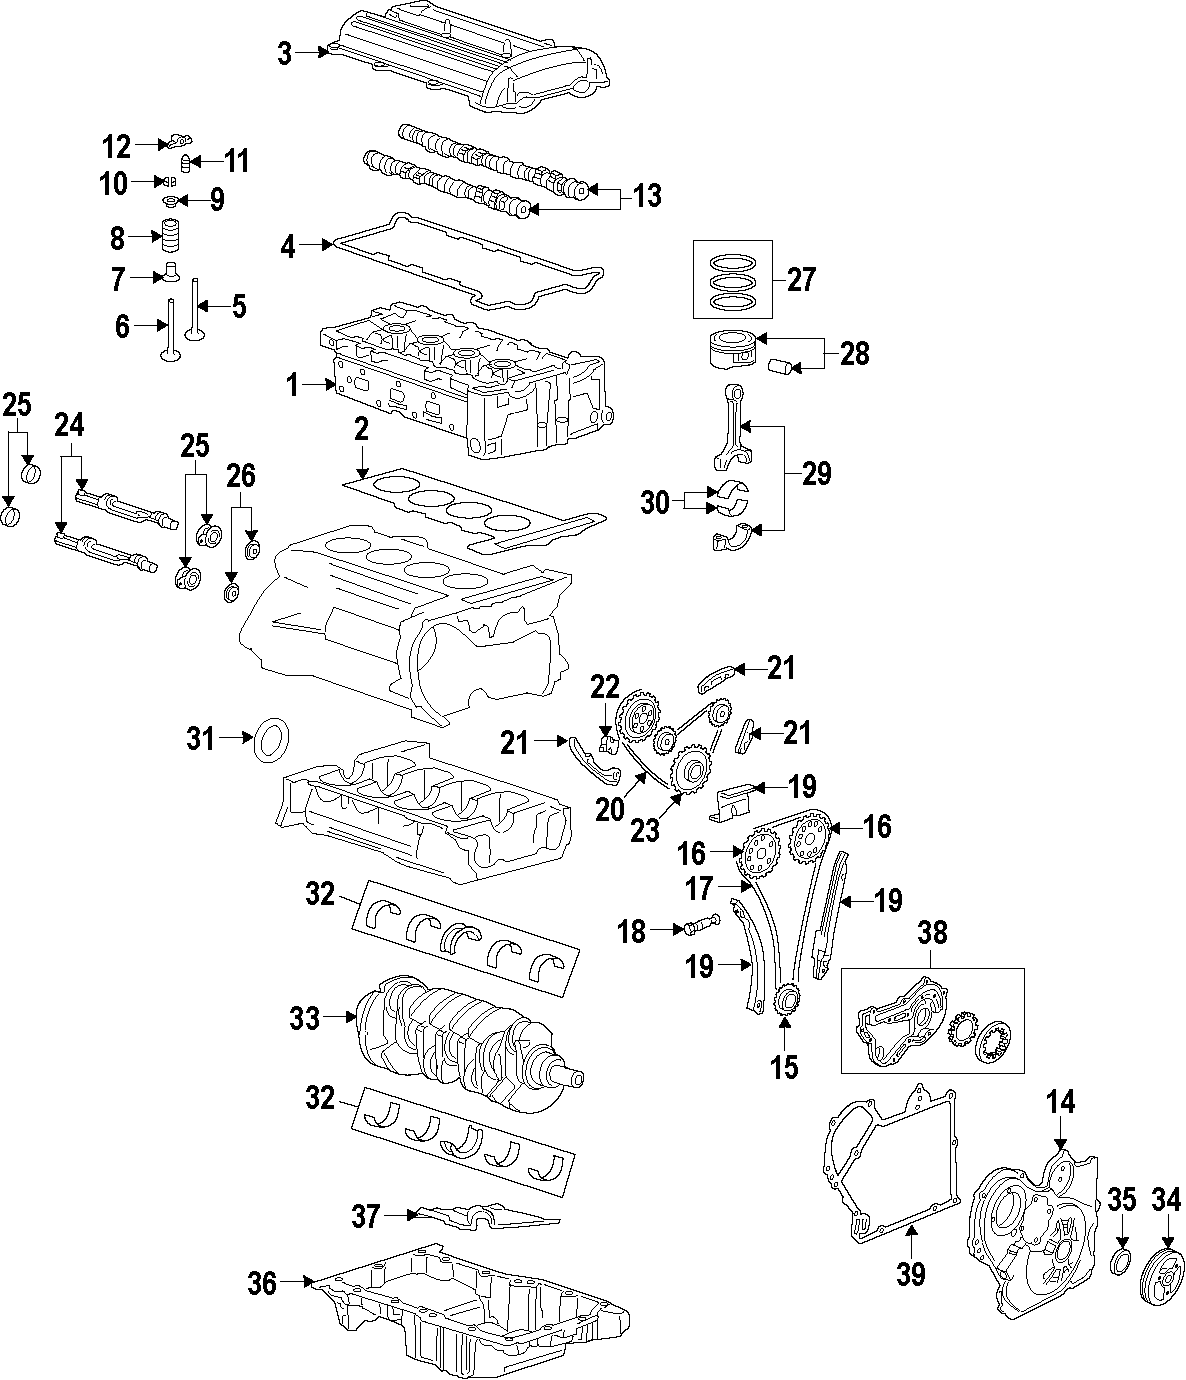 Chevrolet Hhr Engine Oil Pan